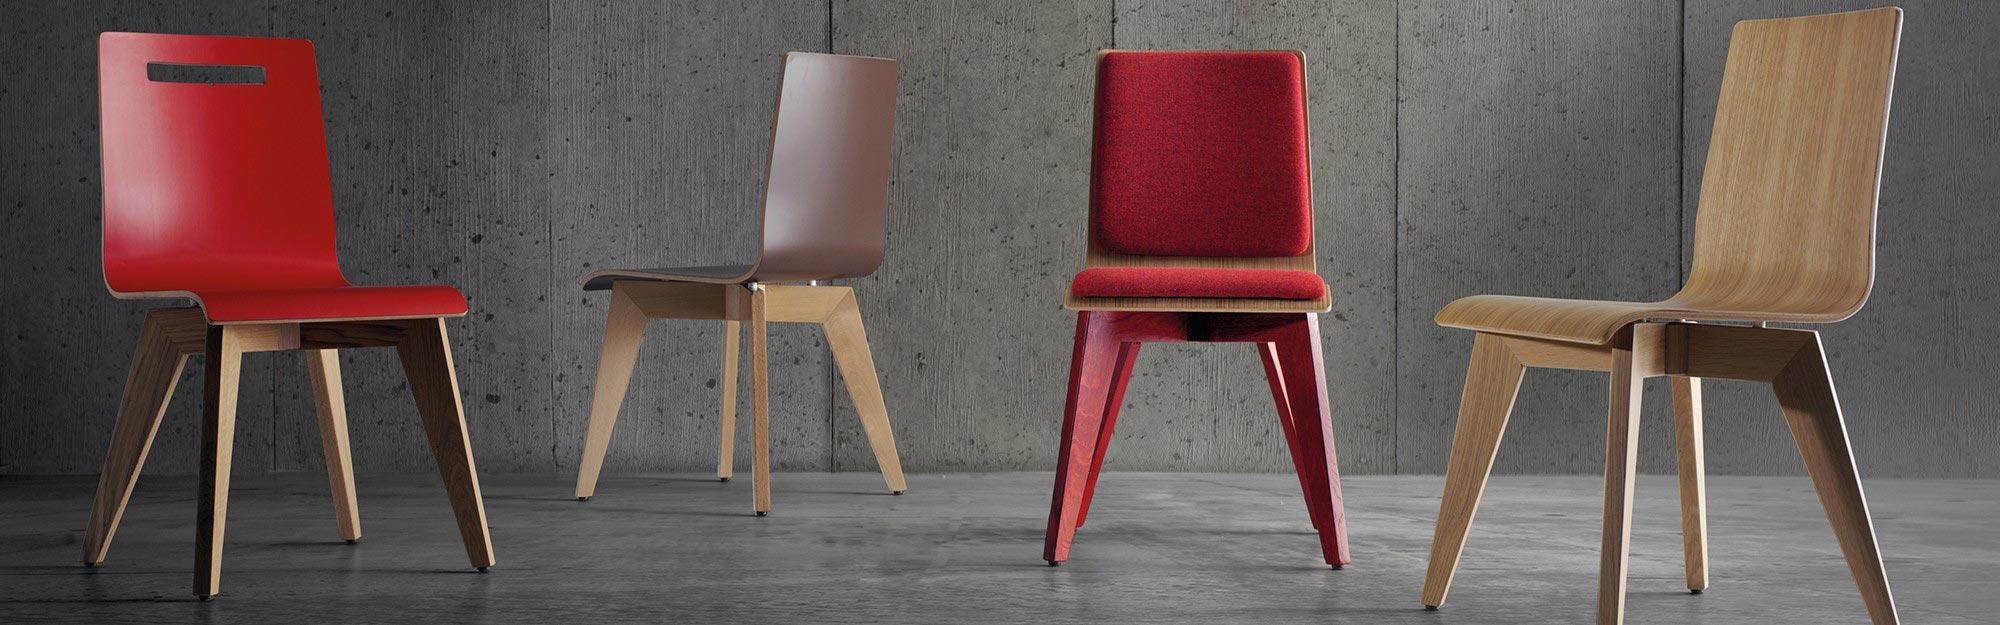 p m furniture mobilier horeca la comanda si design de interior. Black Bedroom Furniture Sets. Home Design Ideas